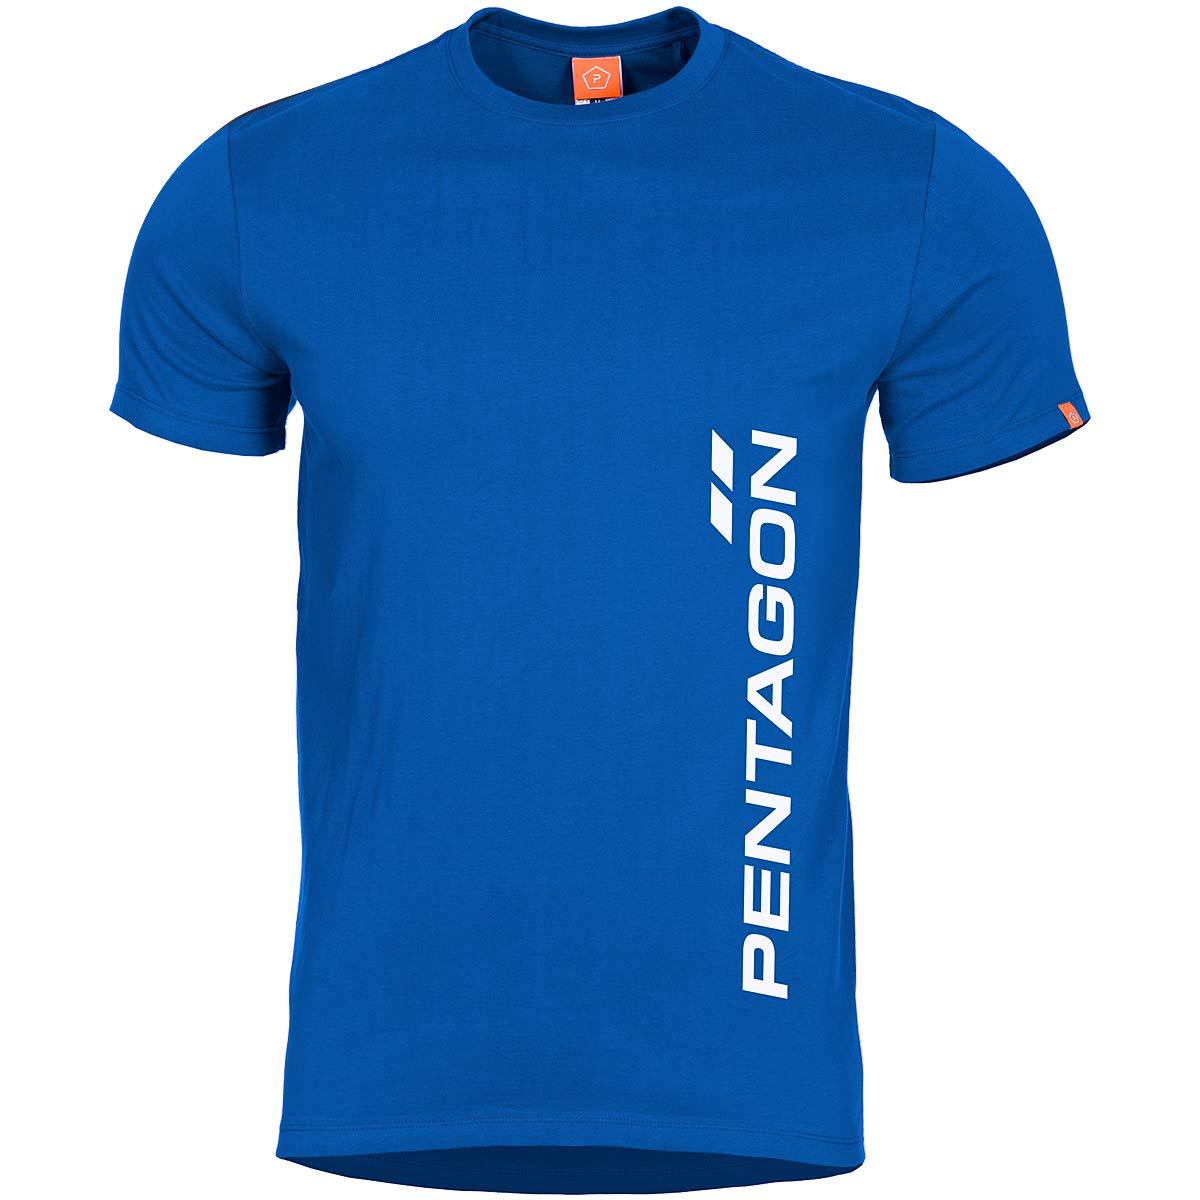 PENTAGON Hombre Ageron Camiseta Vertical Liberty Blue tamaño L ...